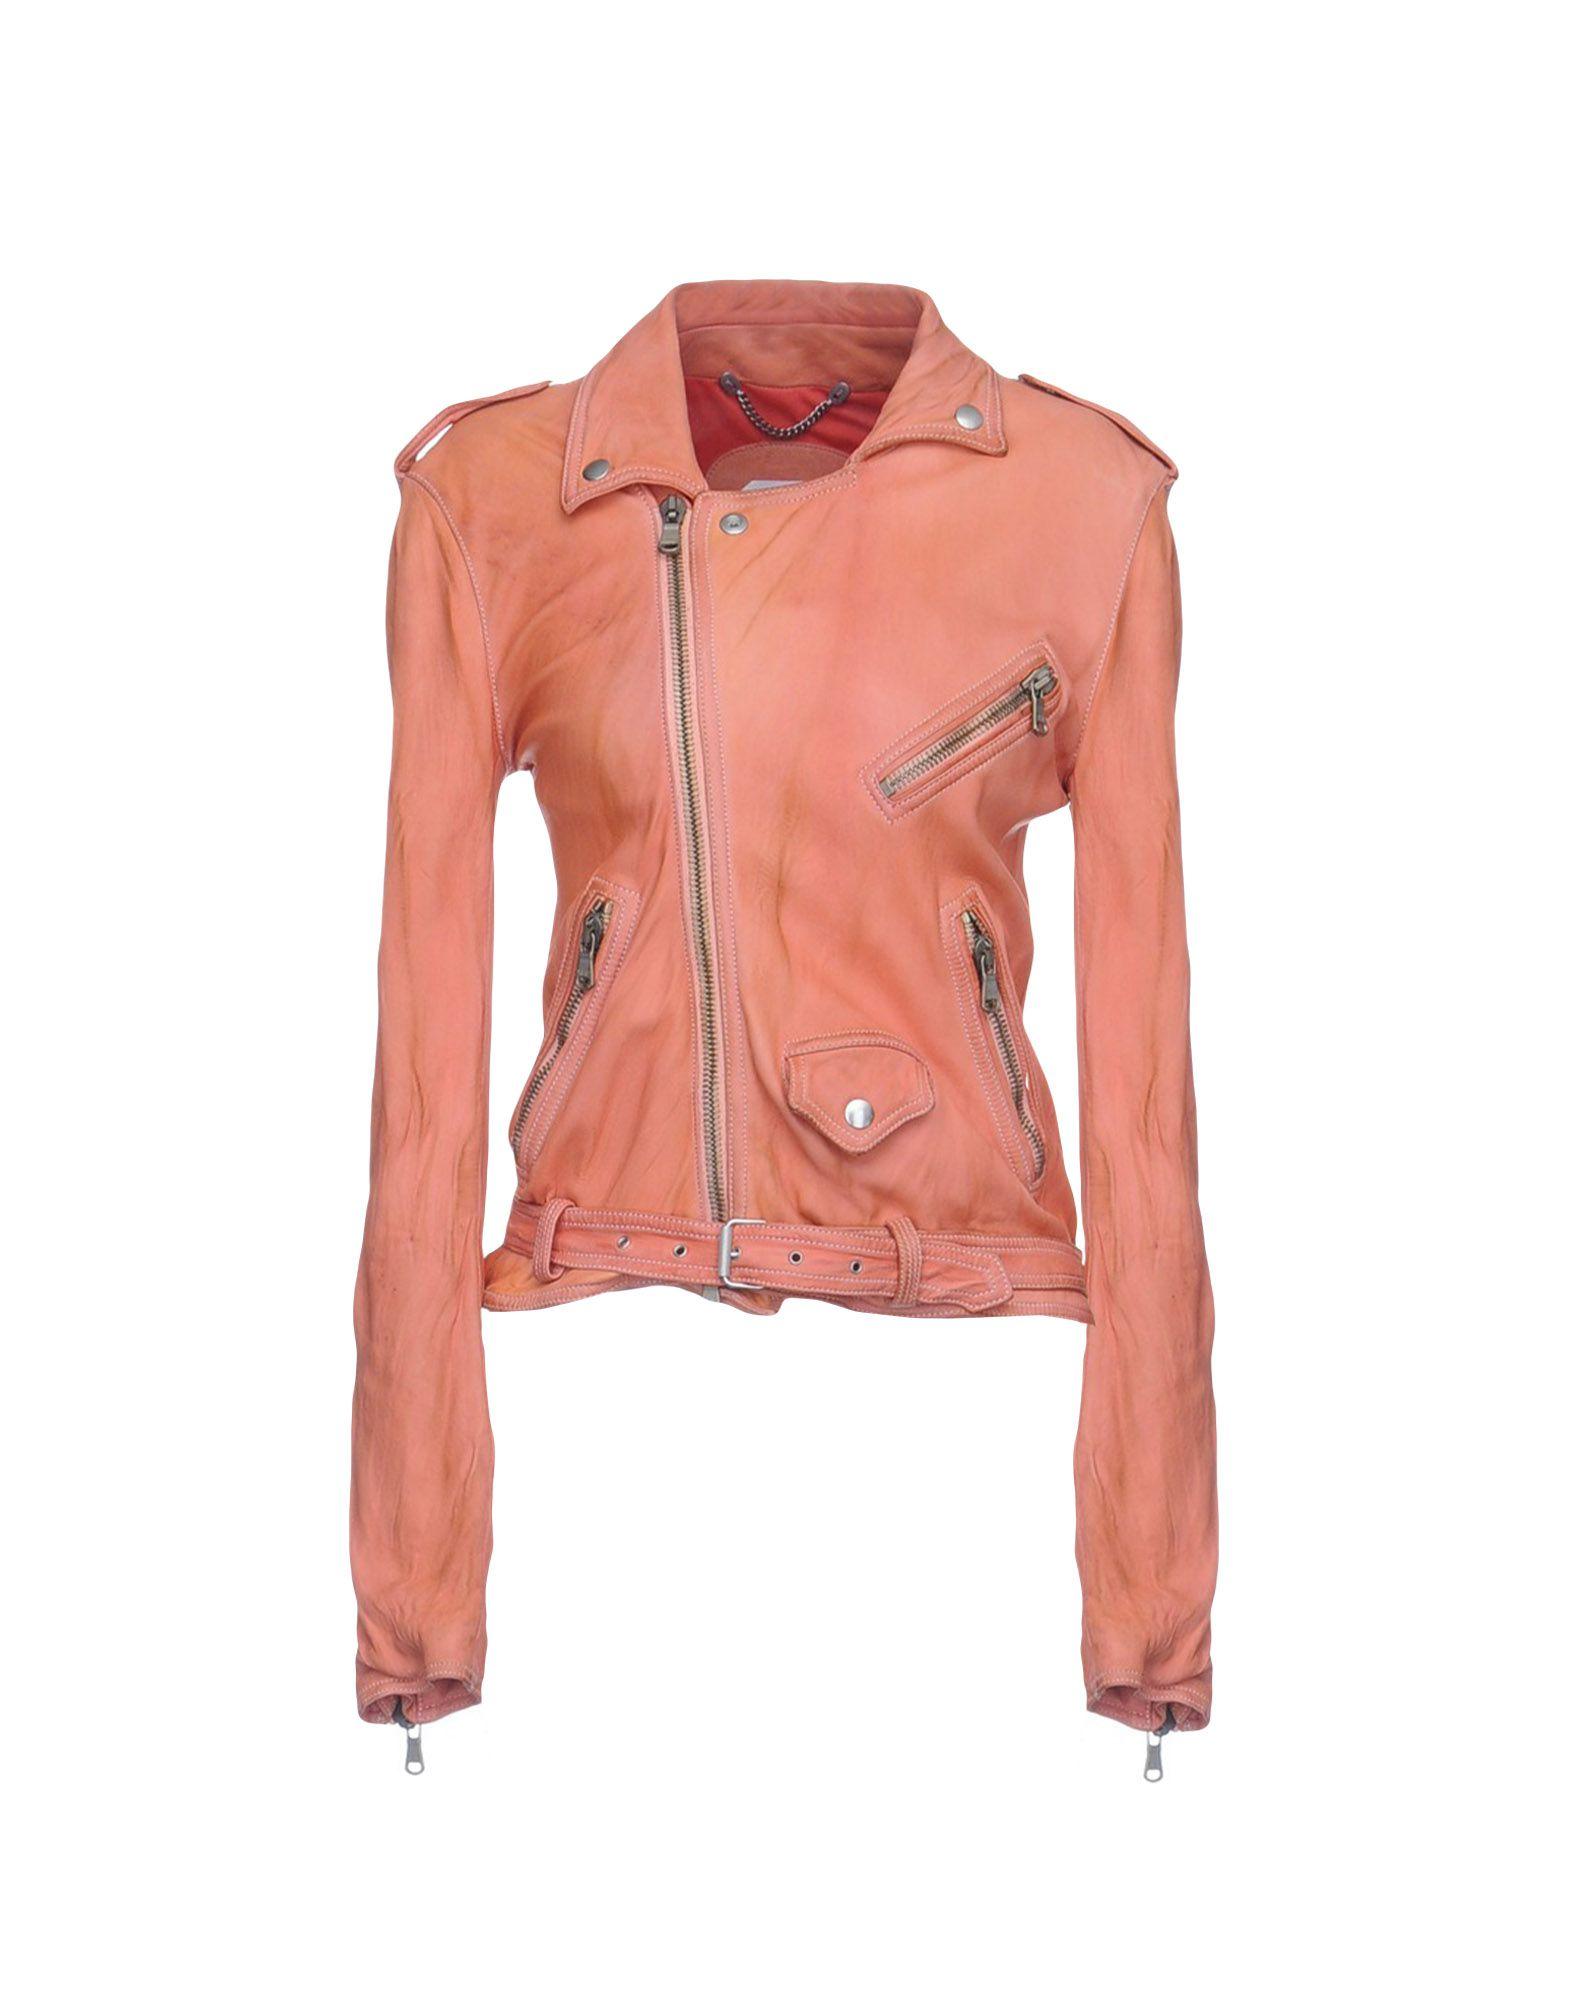 PIHAKAPI Biker Jacket in Salmon Pink